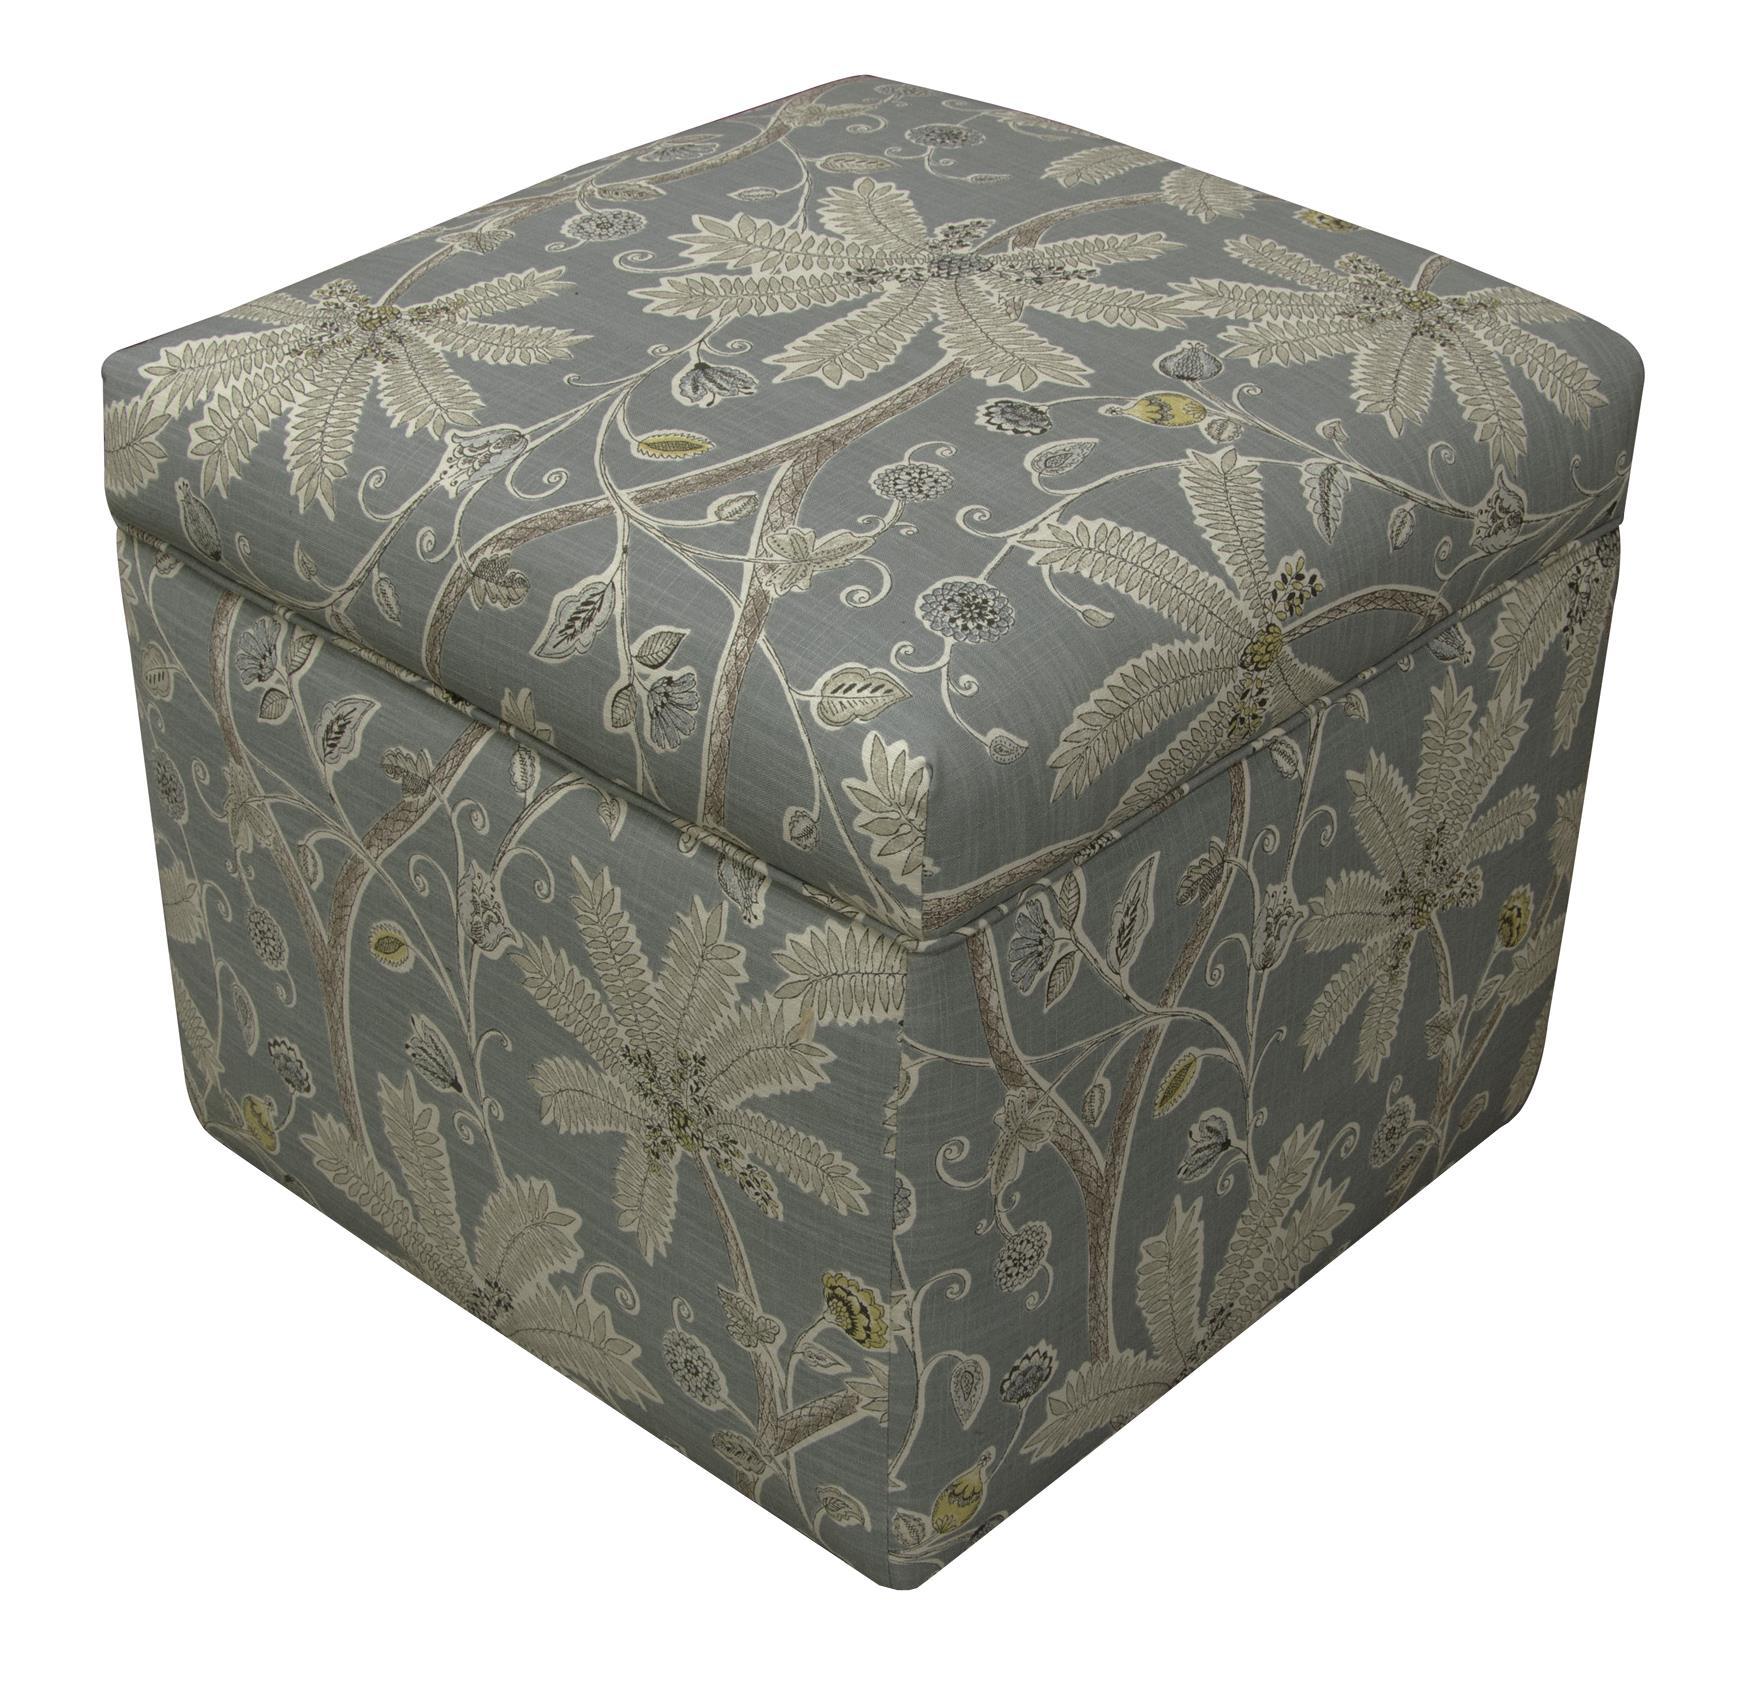 England Parson Storage Ottoman - Item Number: 2F00-81-7351